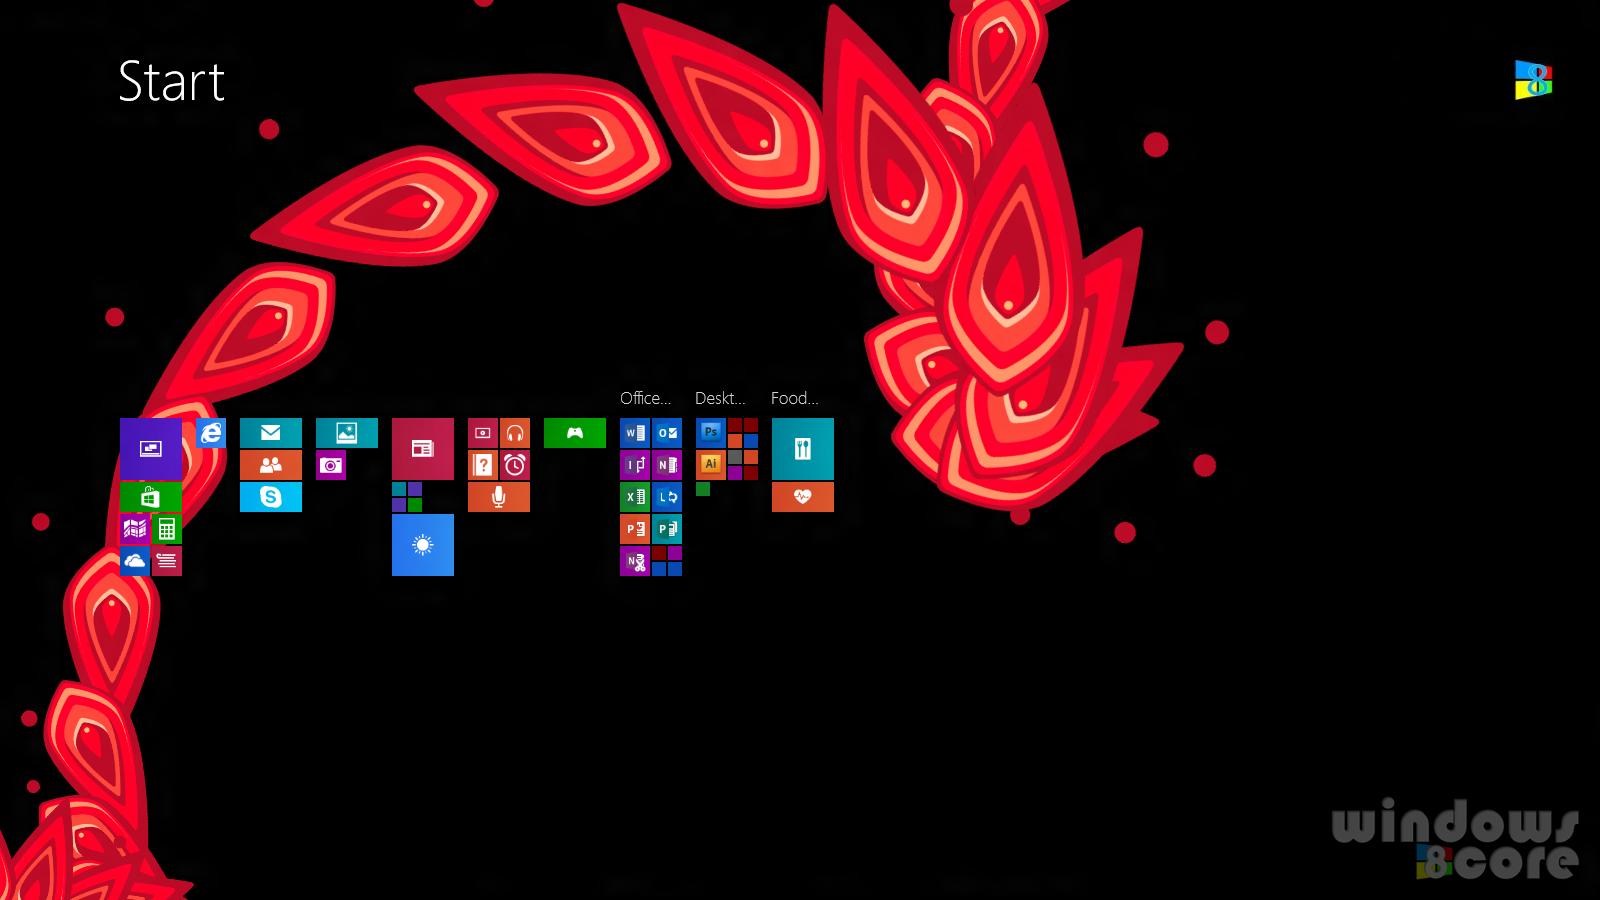 Windows 81 Start Screen 1600x900